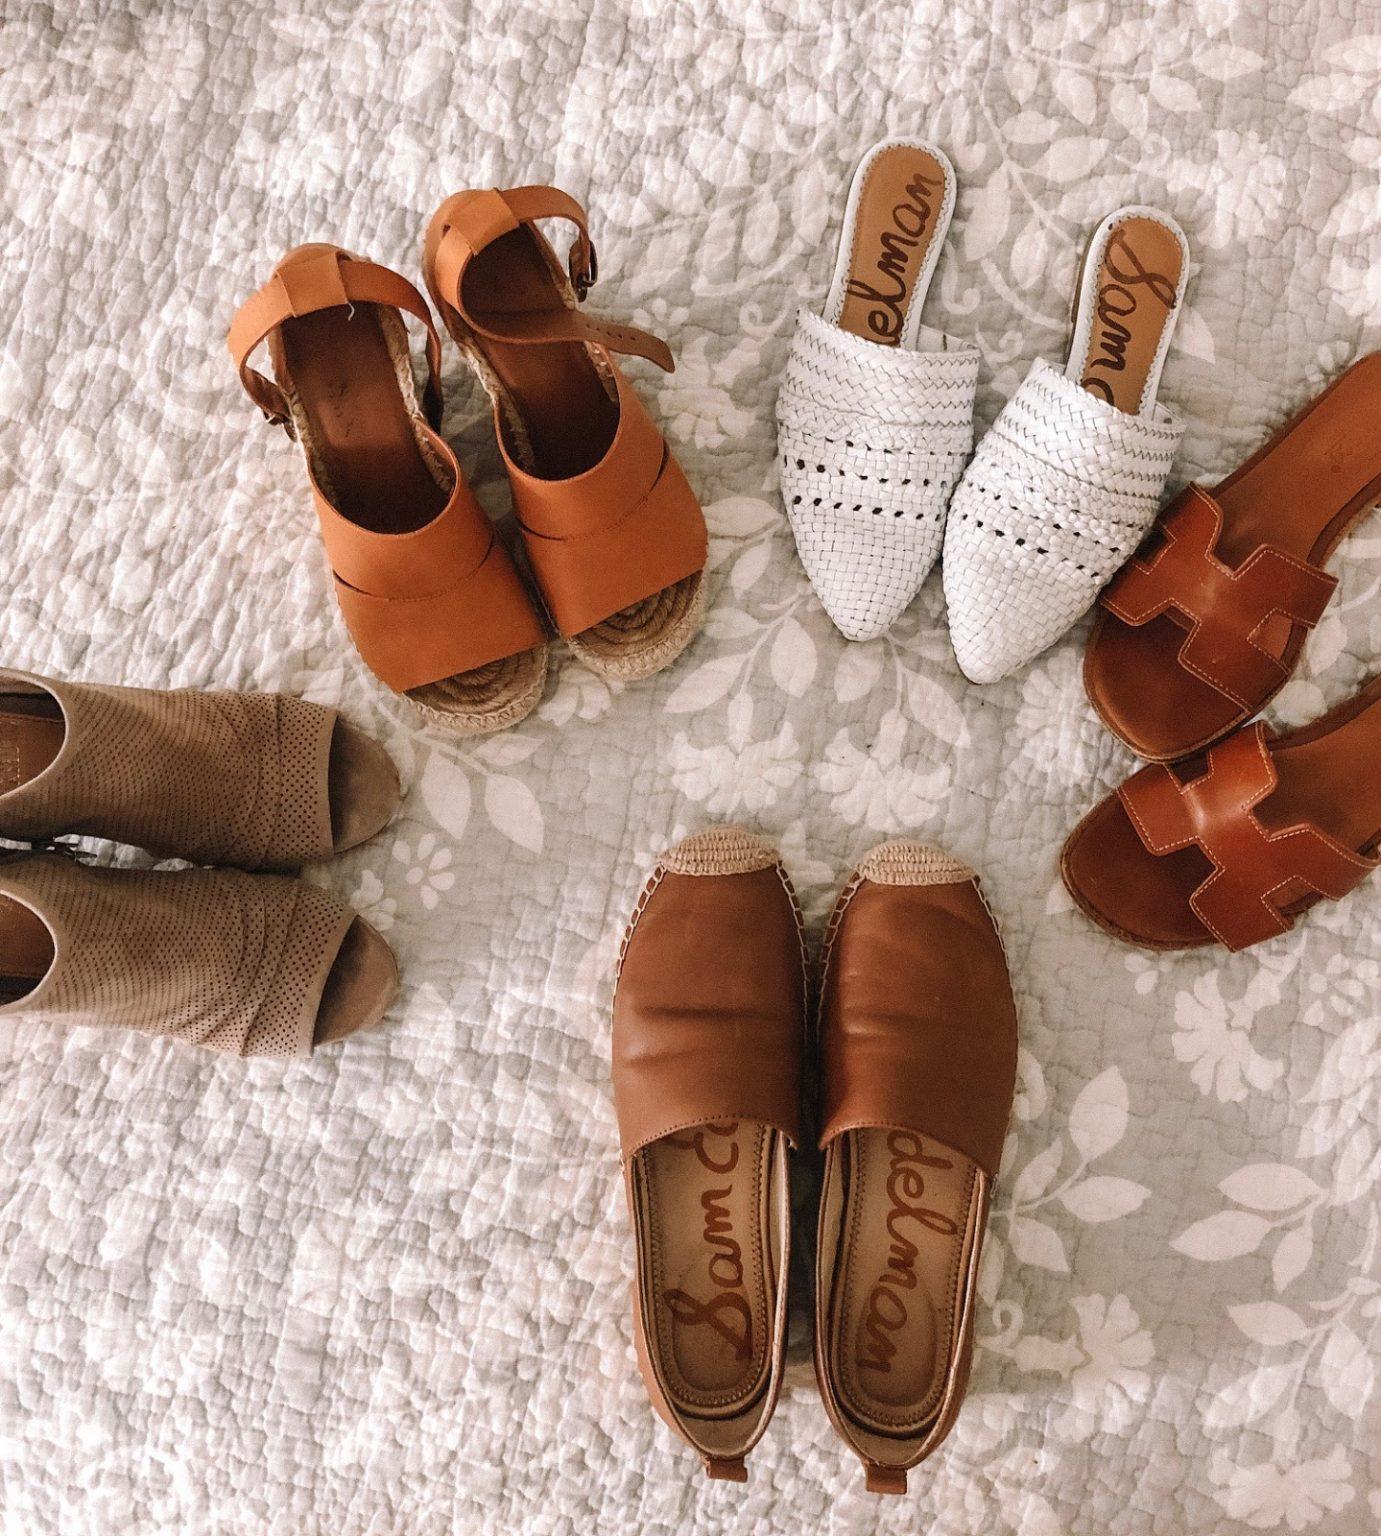 333a6dcf243 5 αγαπημένα καλοκαιρινά παπούτσια ! #Summer2019 - Eli.gr